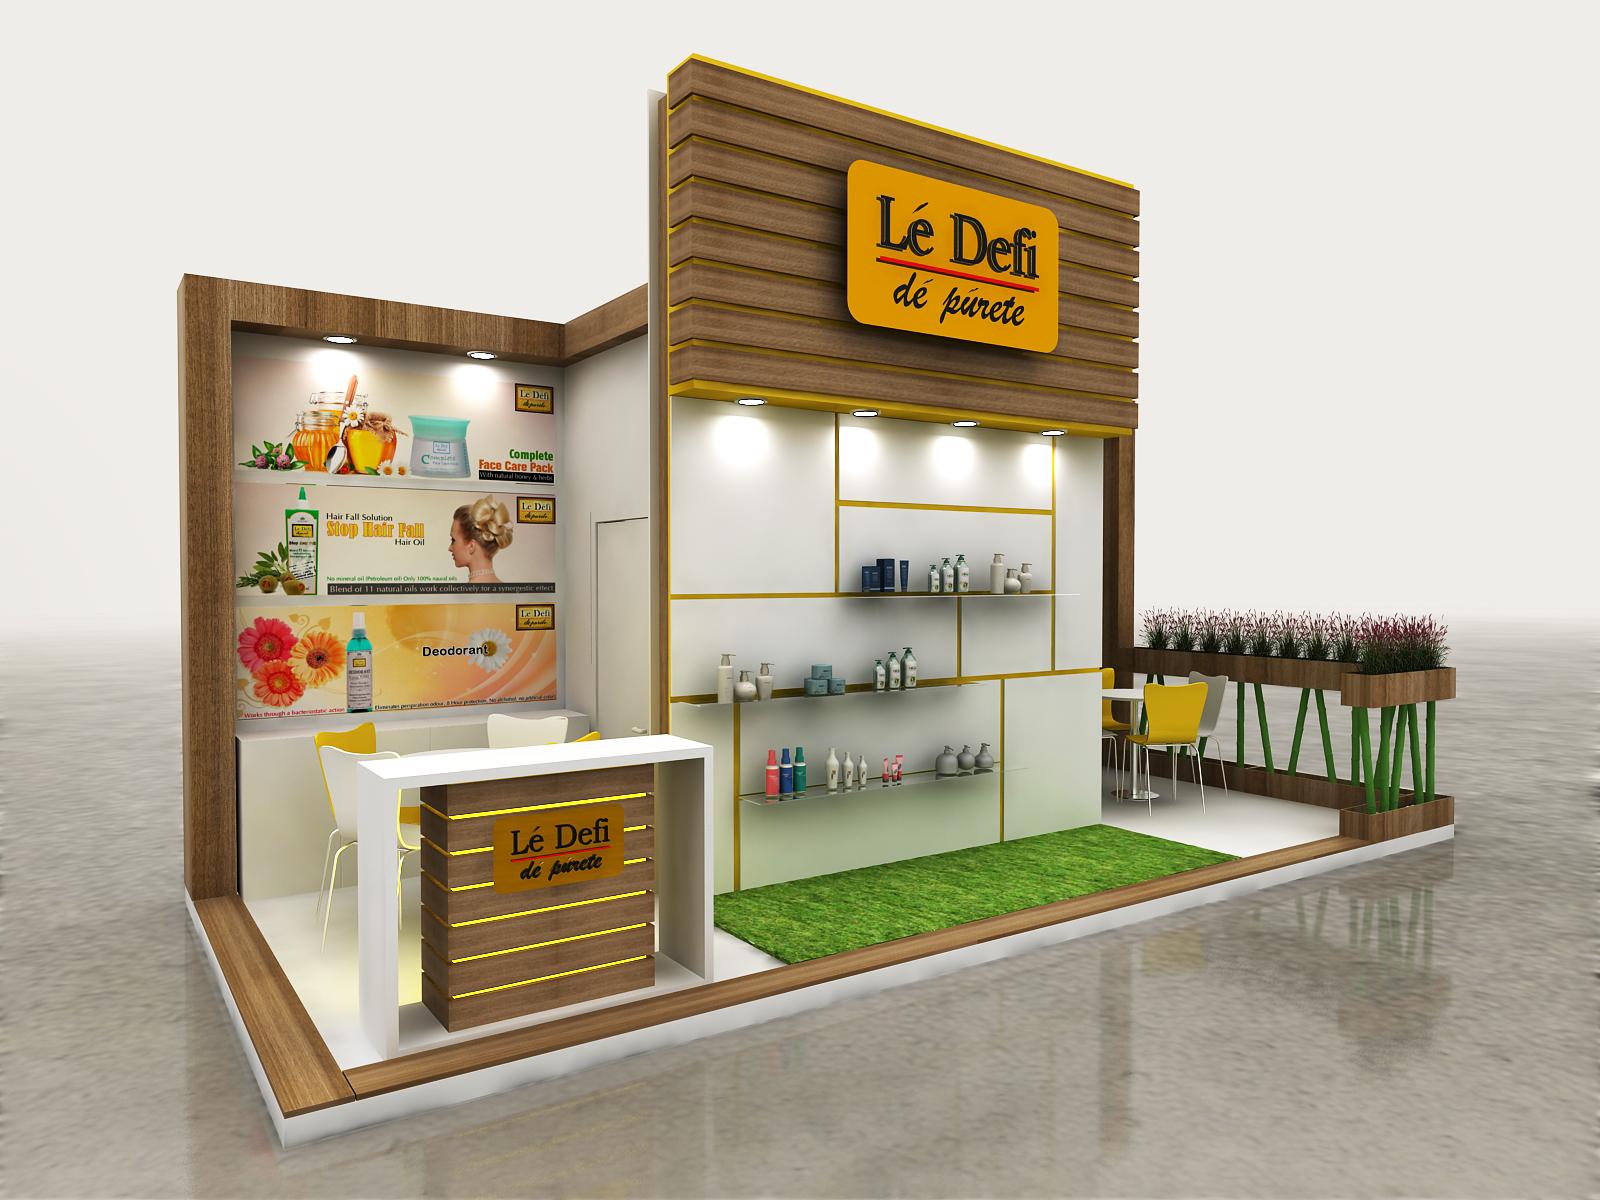 Exhibition Stand Design Coroflot : Le defi exhibition stand by theosign design at coroflot